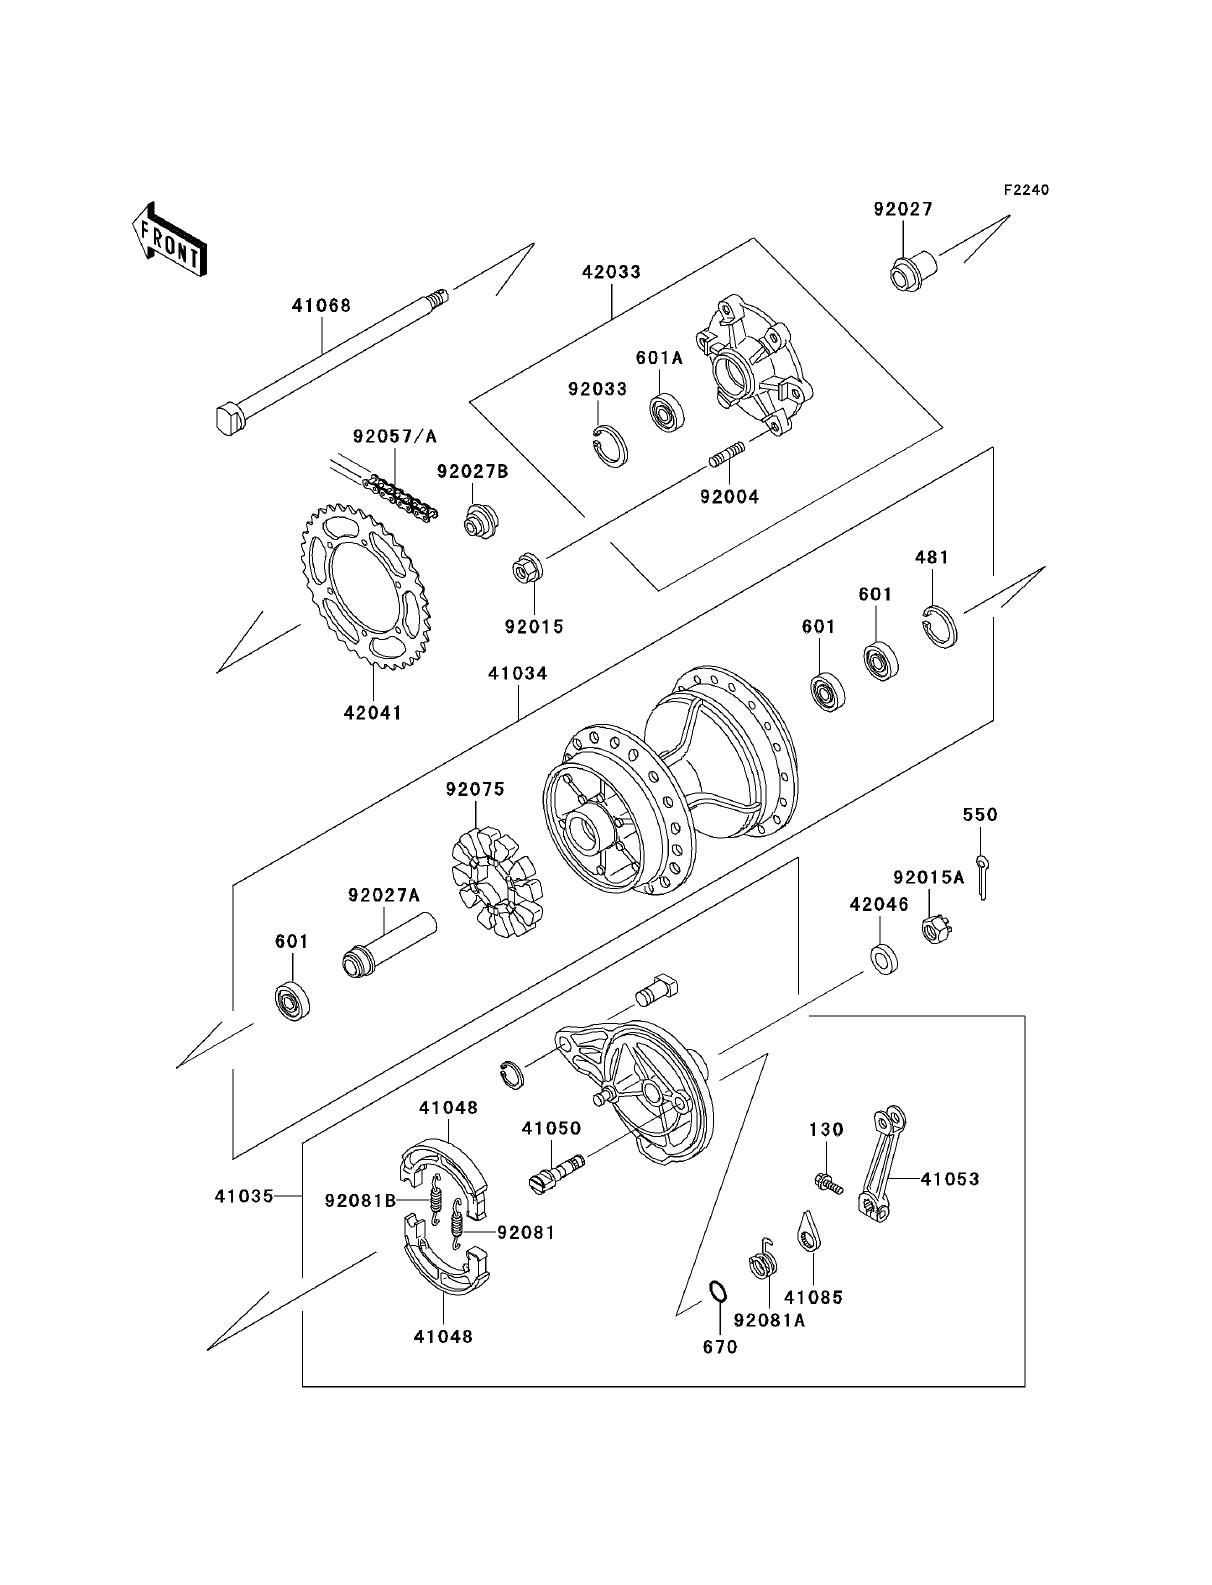 Drum Brake assembly Diagram Kawasaki Klr250 Kawasaki